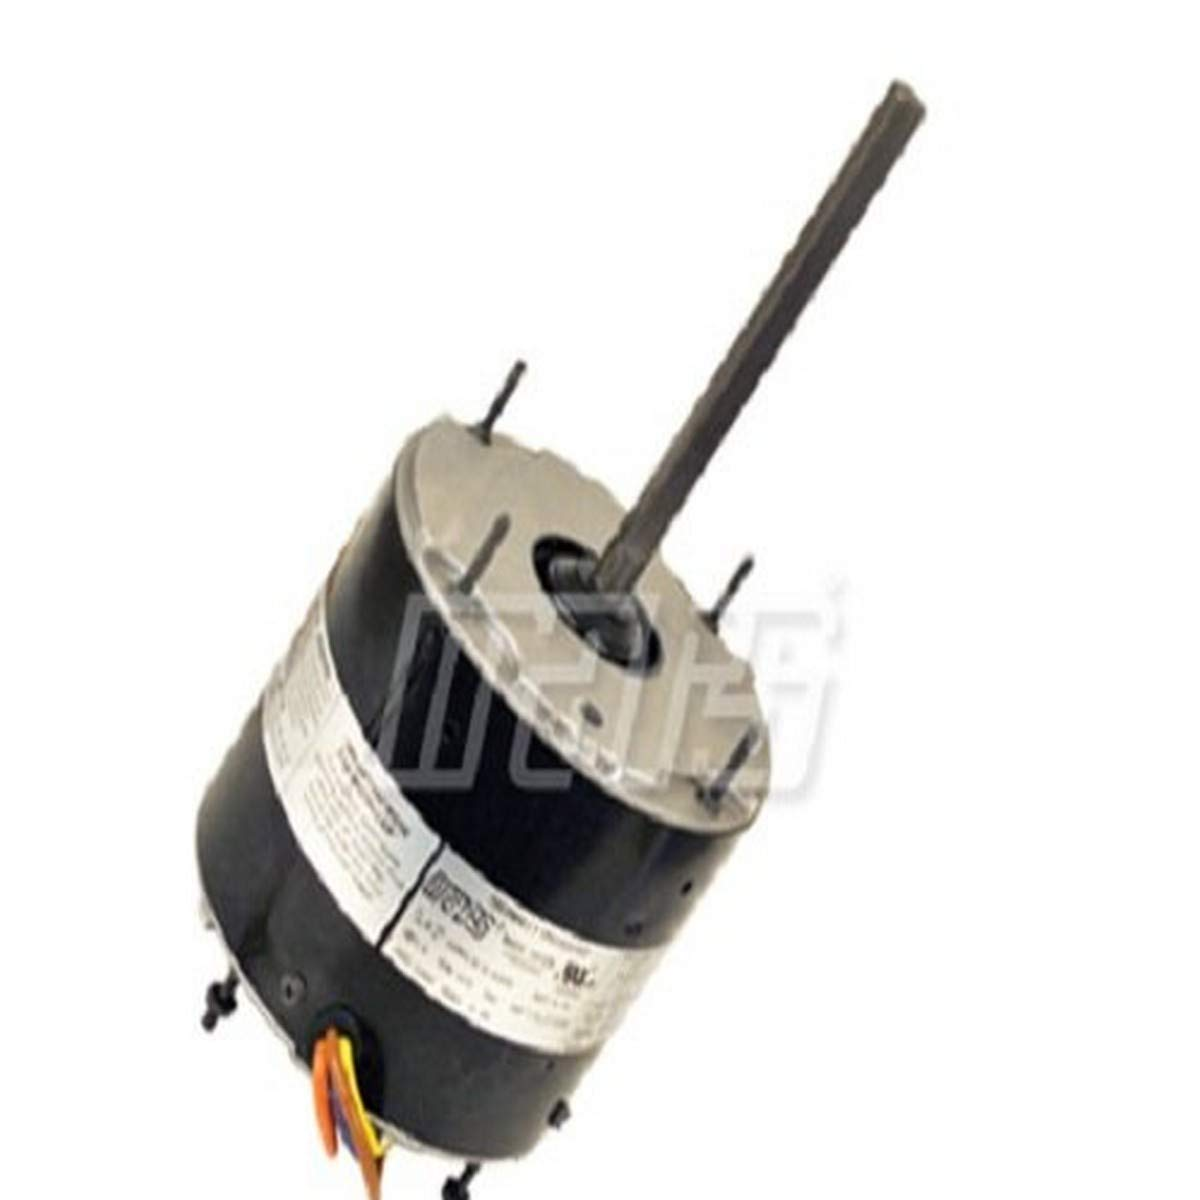 MARS - Motors  Armatures 10728 1/4 hp 1075 rpm - 1 Speed 1.8 Am